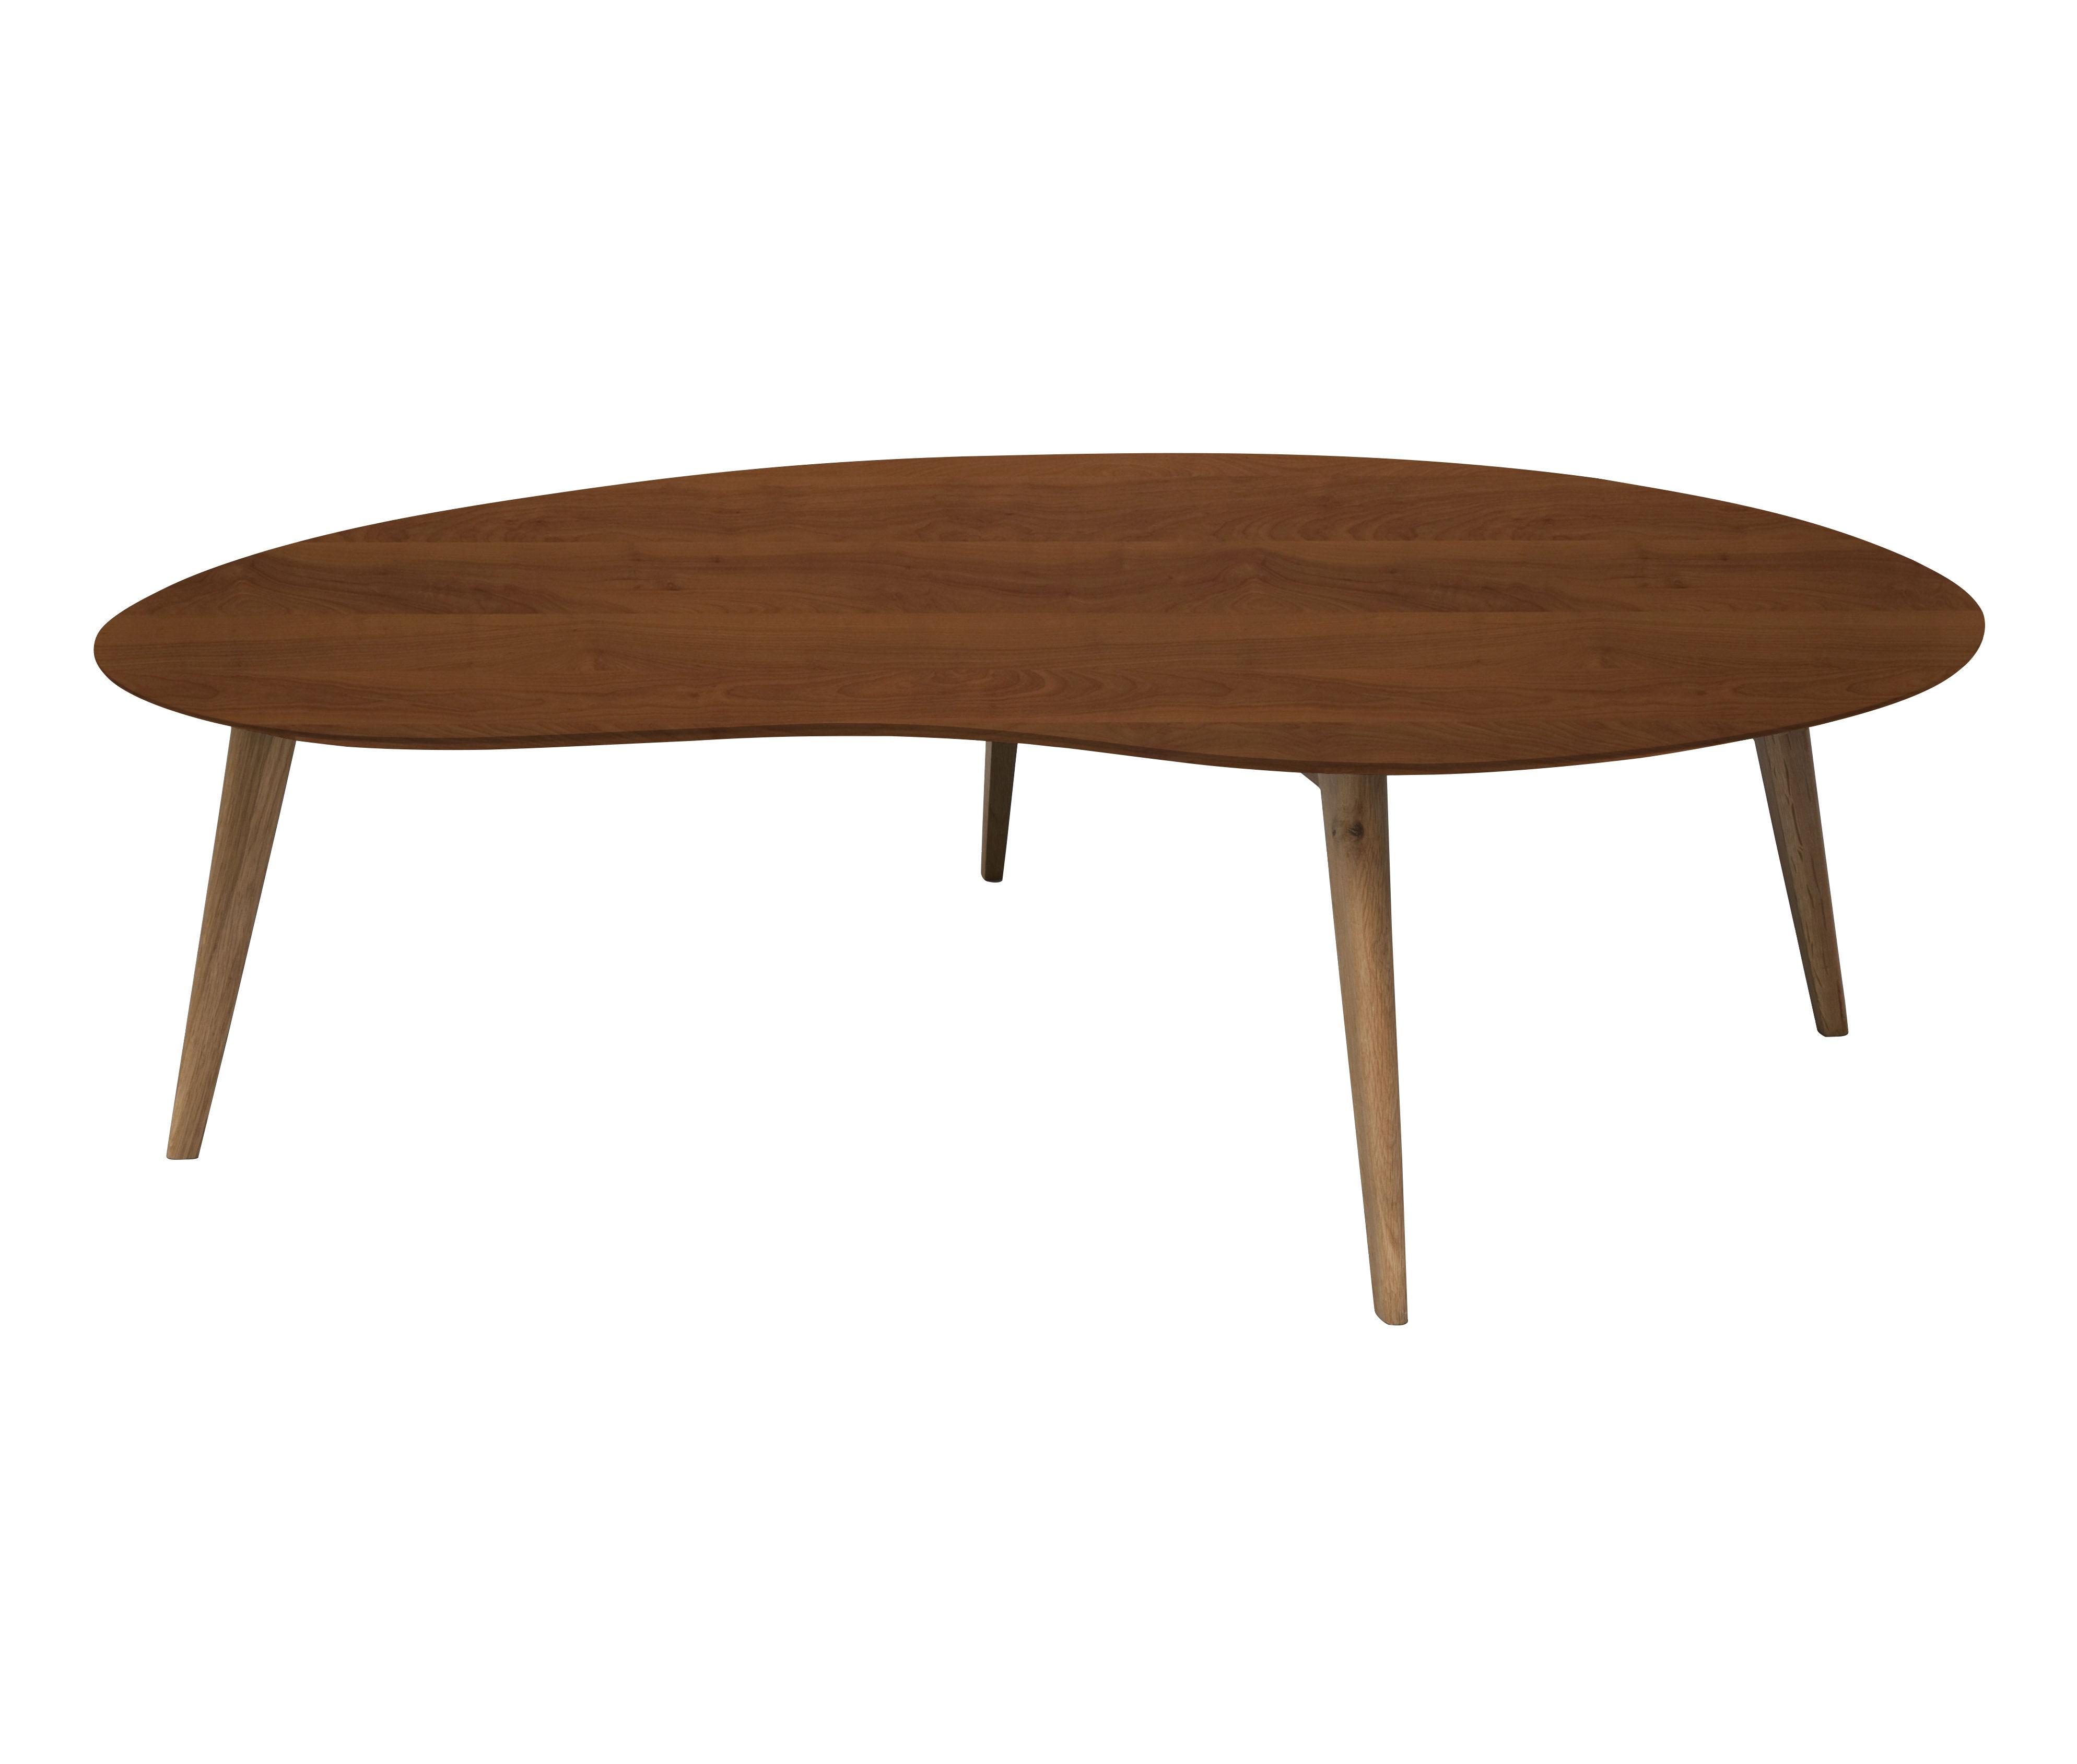 table basse lalinde haricot xxl l 130 cm teck pieds ch ne sentou edition. Black Bedroom Furniture Sets. Home Design Ideas